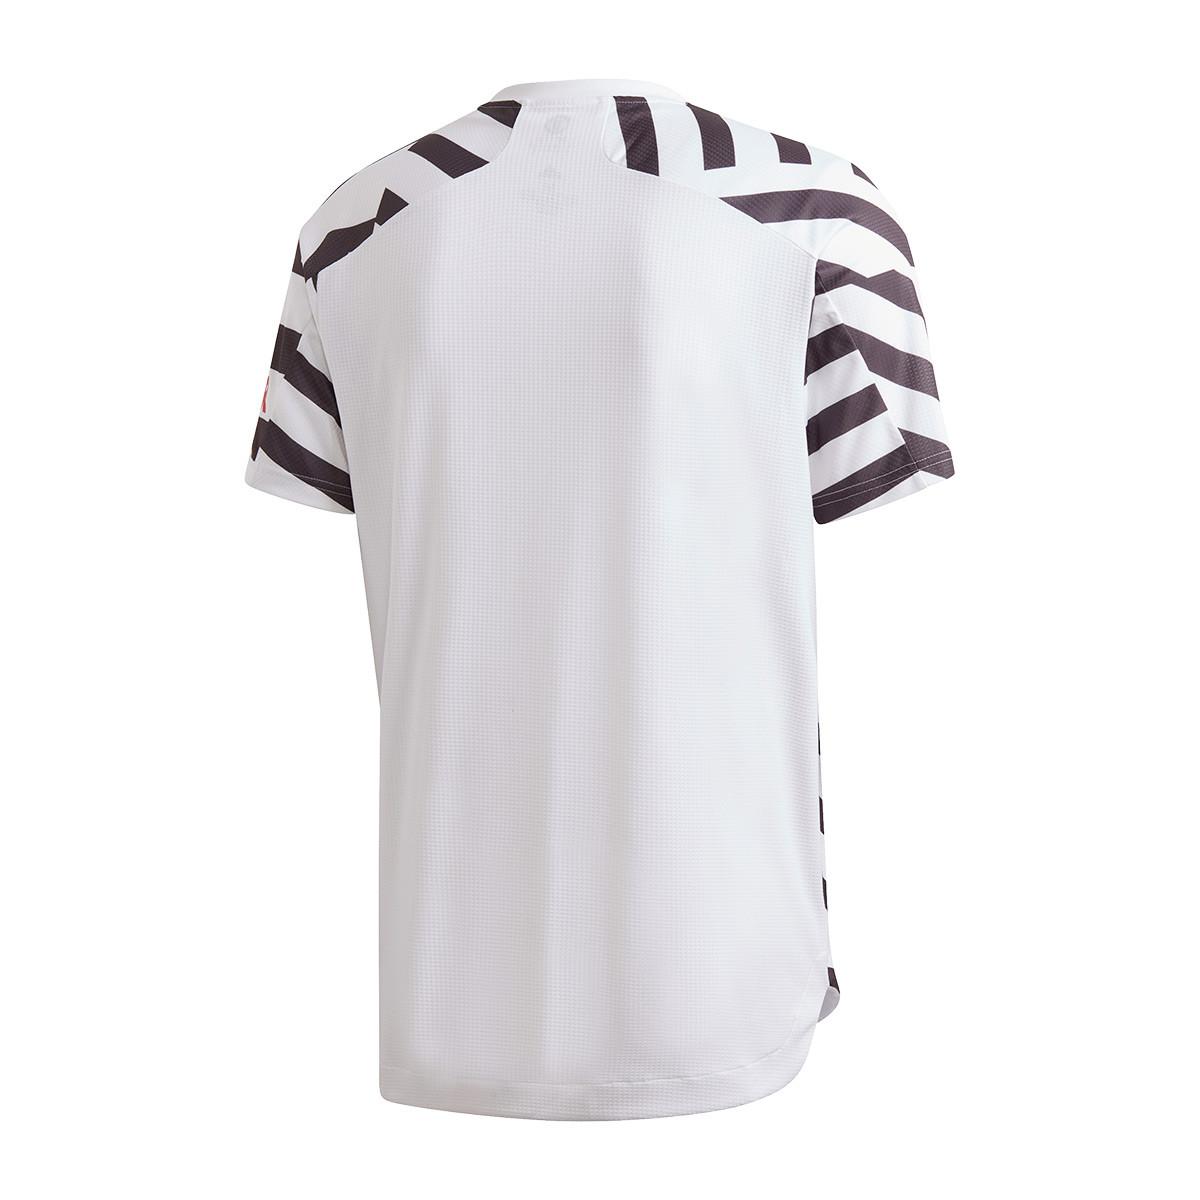 Jersey Adidas Manchester United Fc Authentic 2020 2021 Third White Black Football Store Futbol Emotion